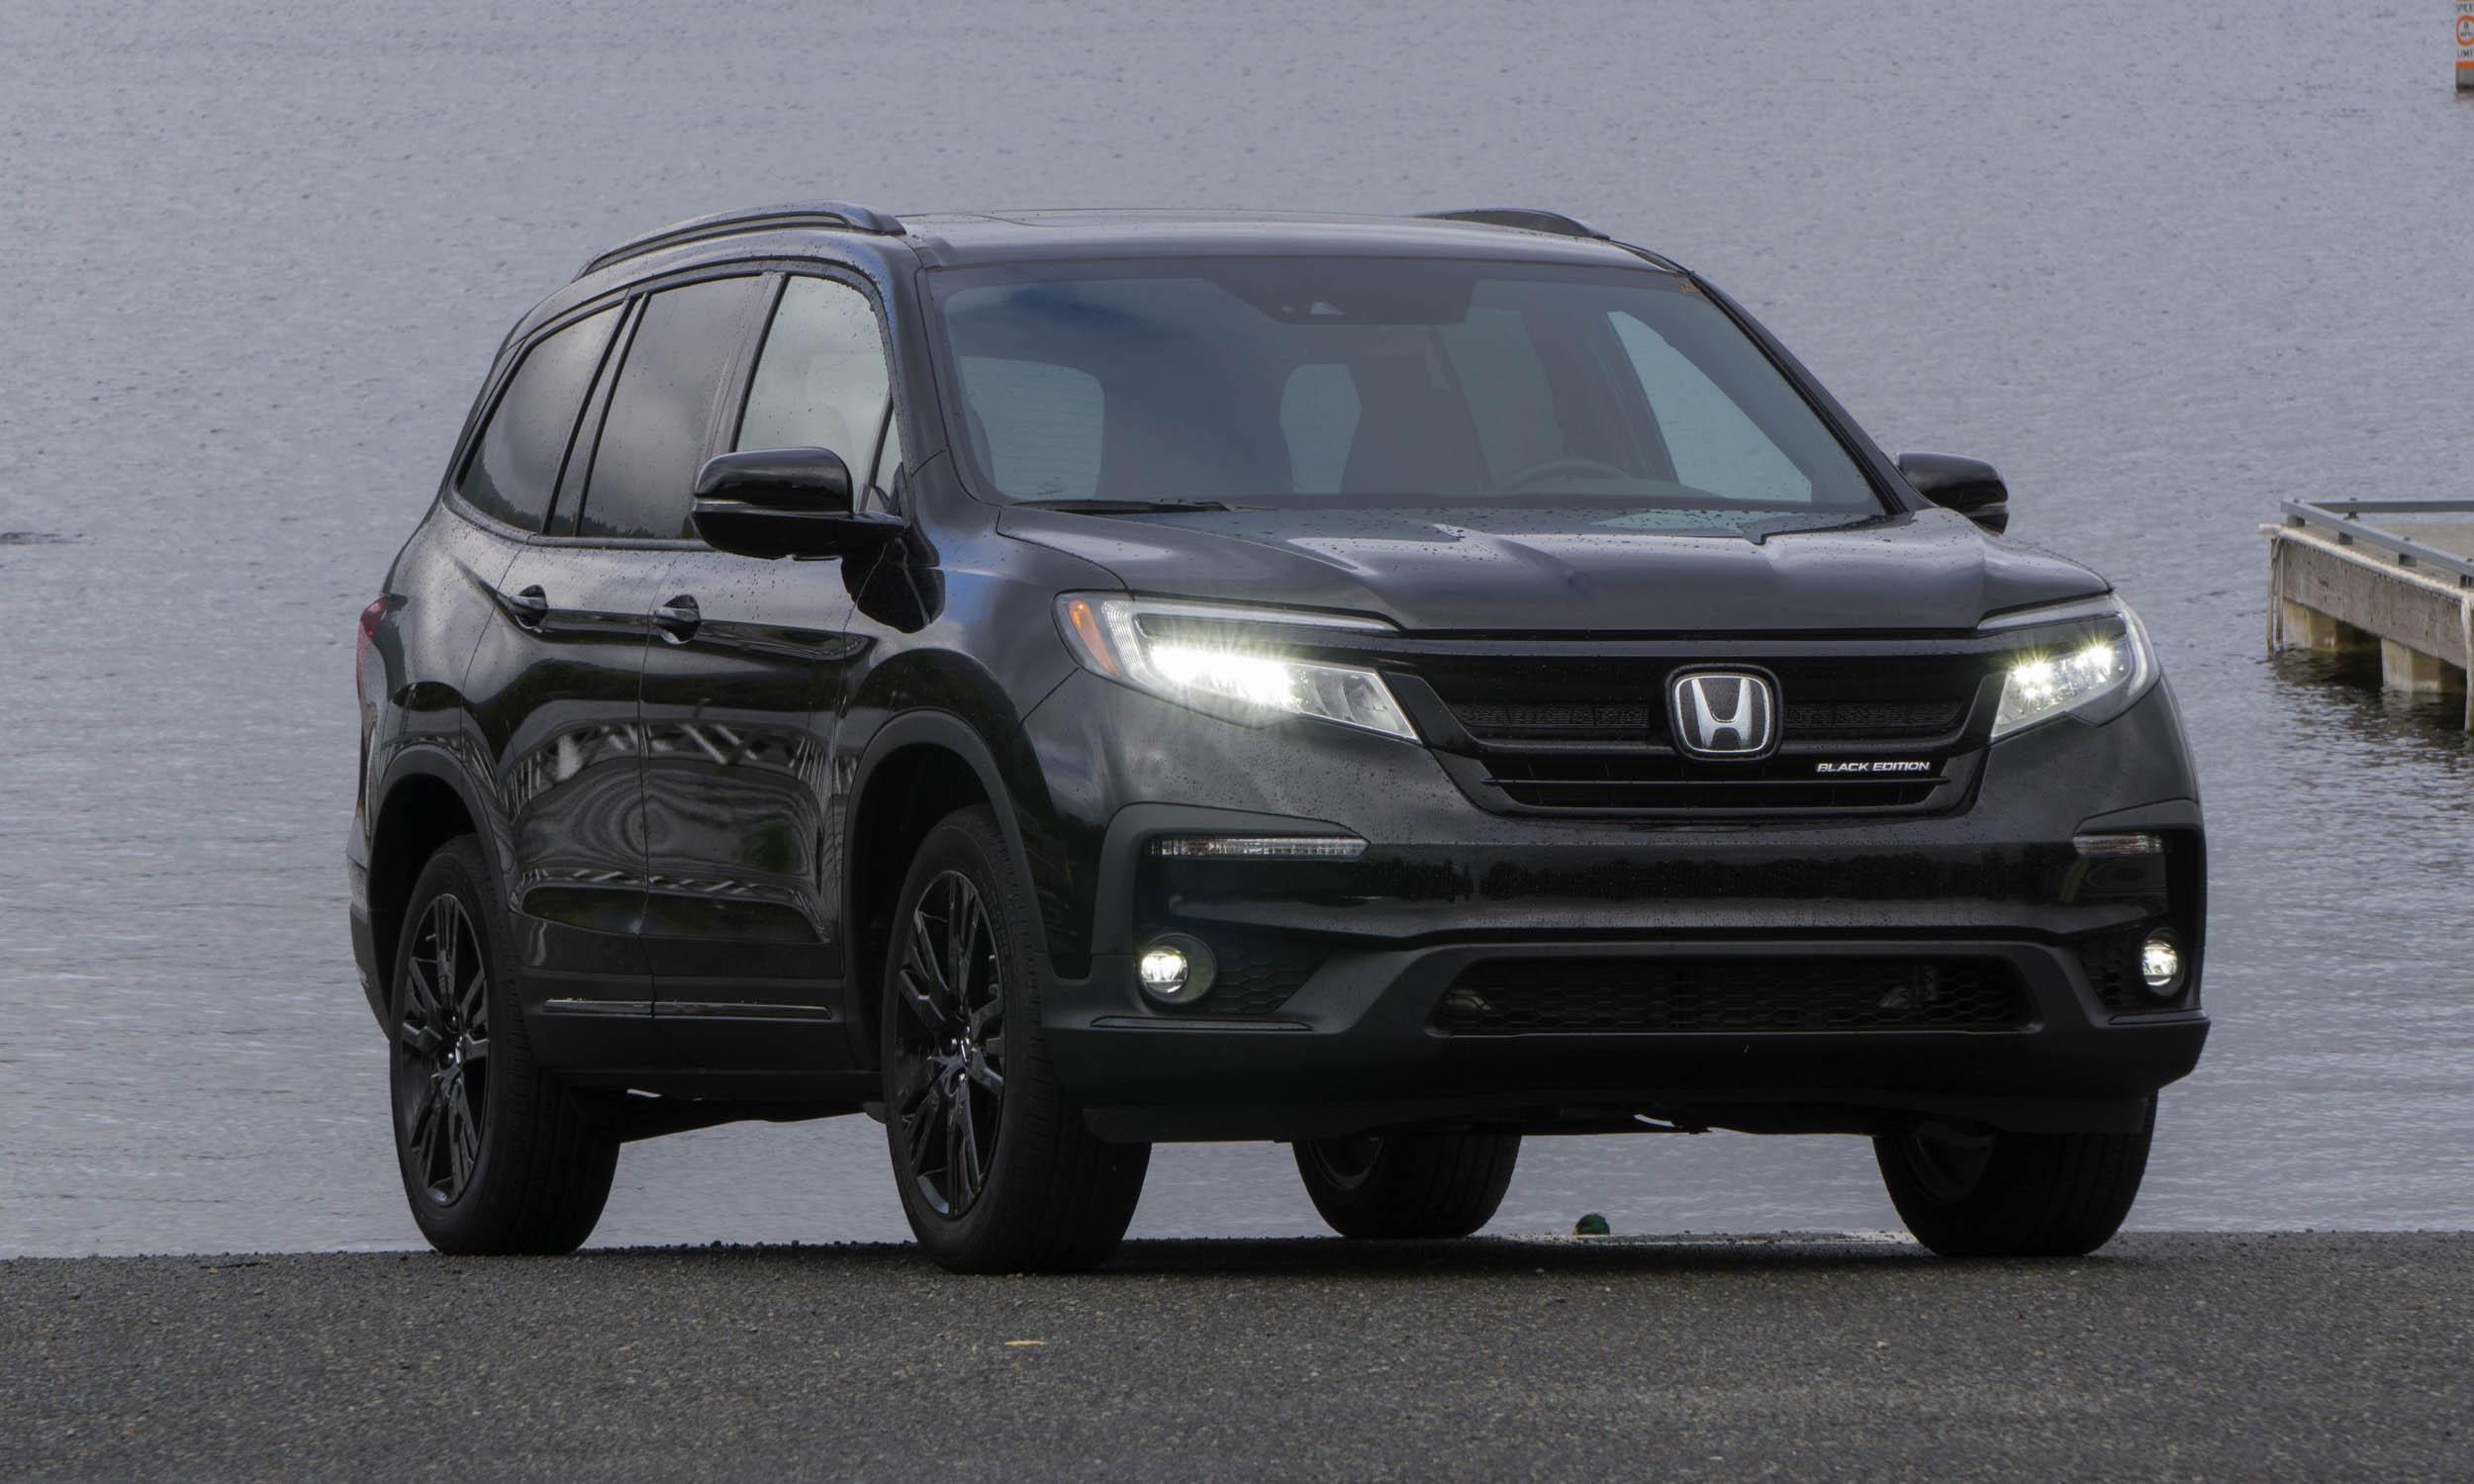 Honda Pilot 2020 Review.2020 Honda Pilot Black Edition Review Autonxt